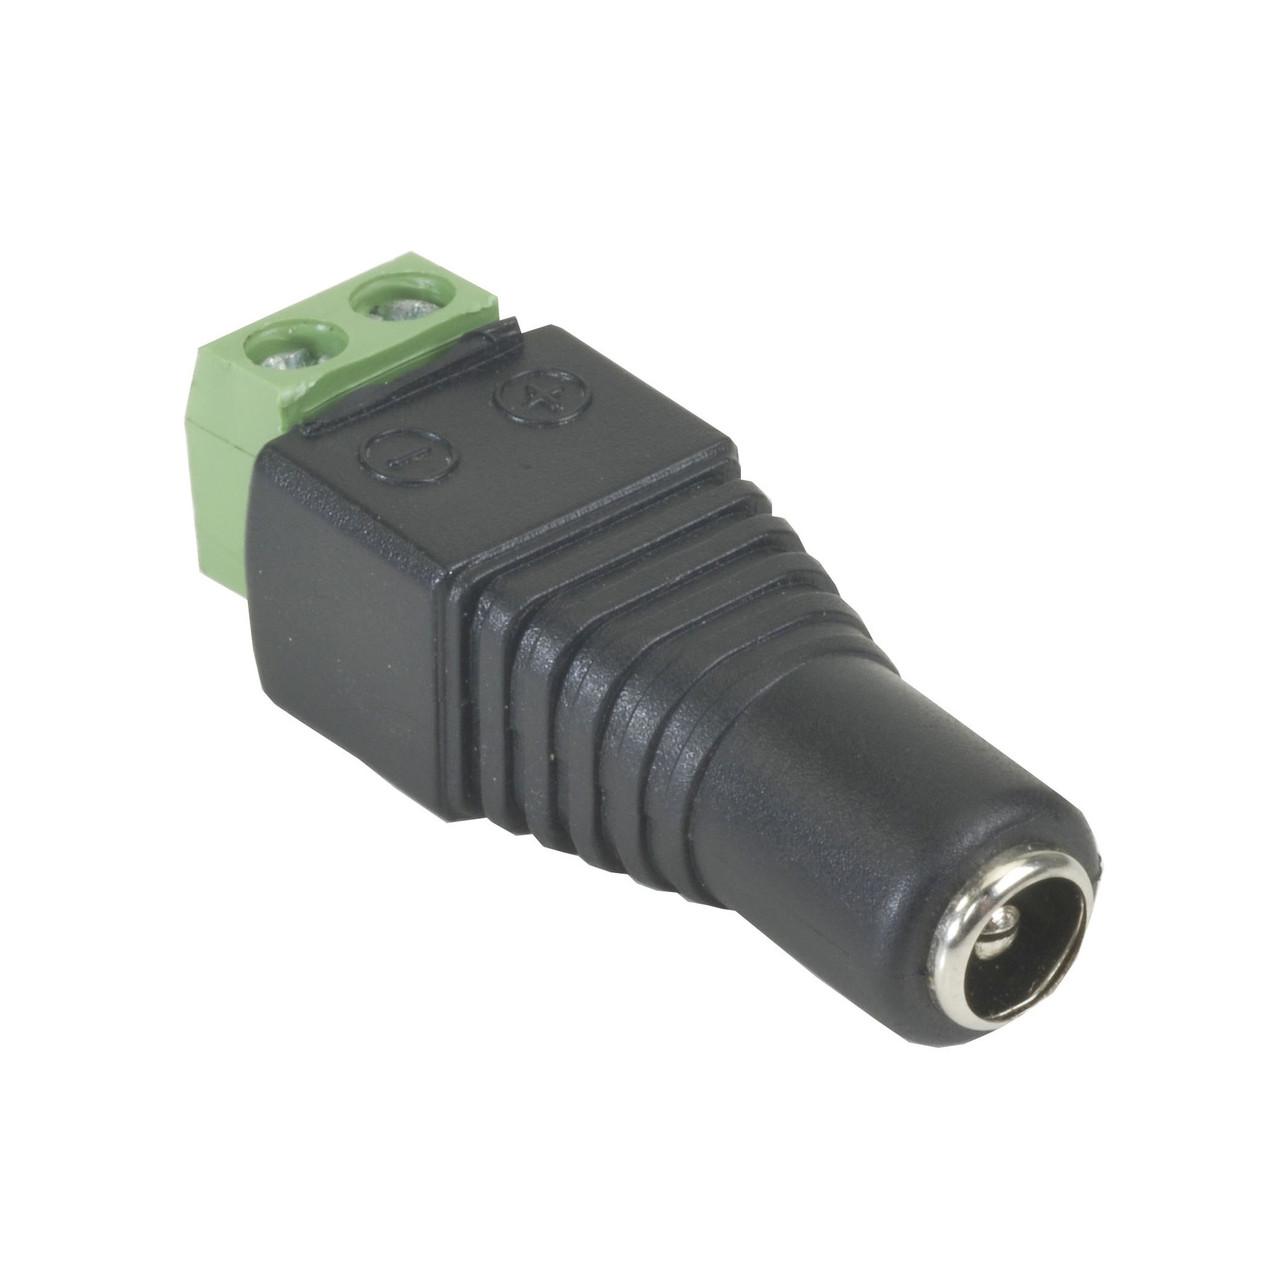 Разъем Коннектор - переходник PV-LINK PV-T2M